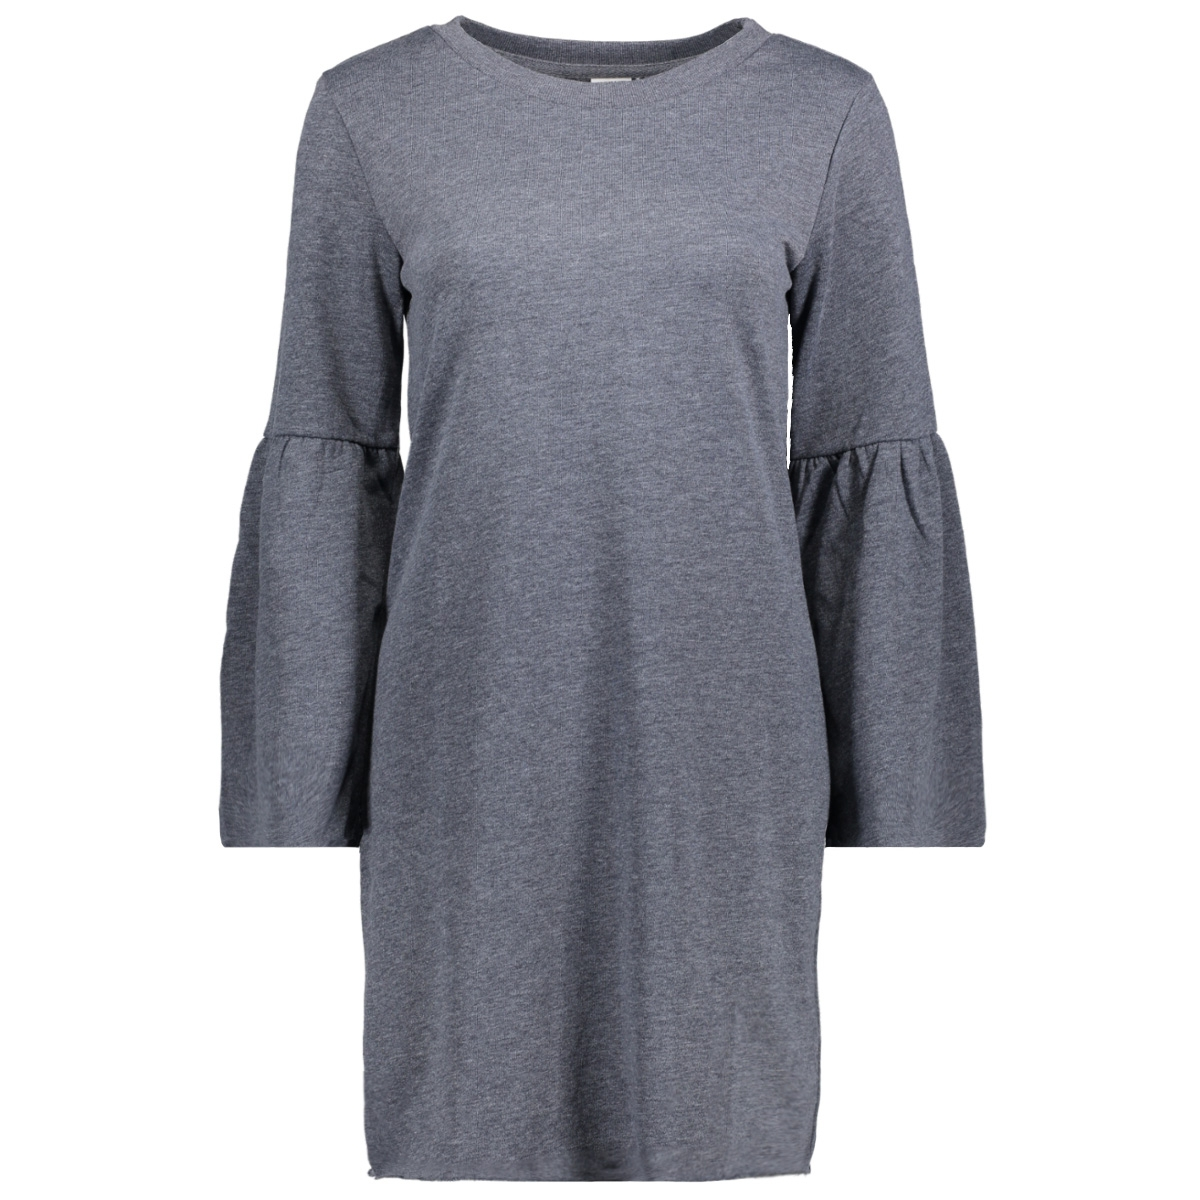 jdyprove l/s wide sl sweat dress sw 15146670 jacqueline de yong jurk dress blues/melange